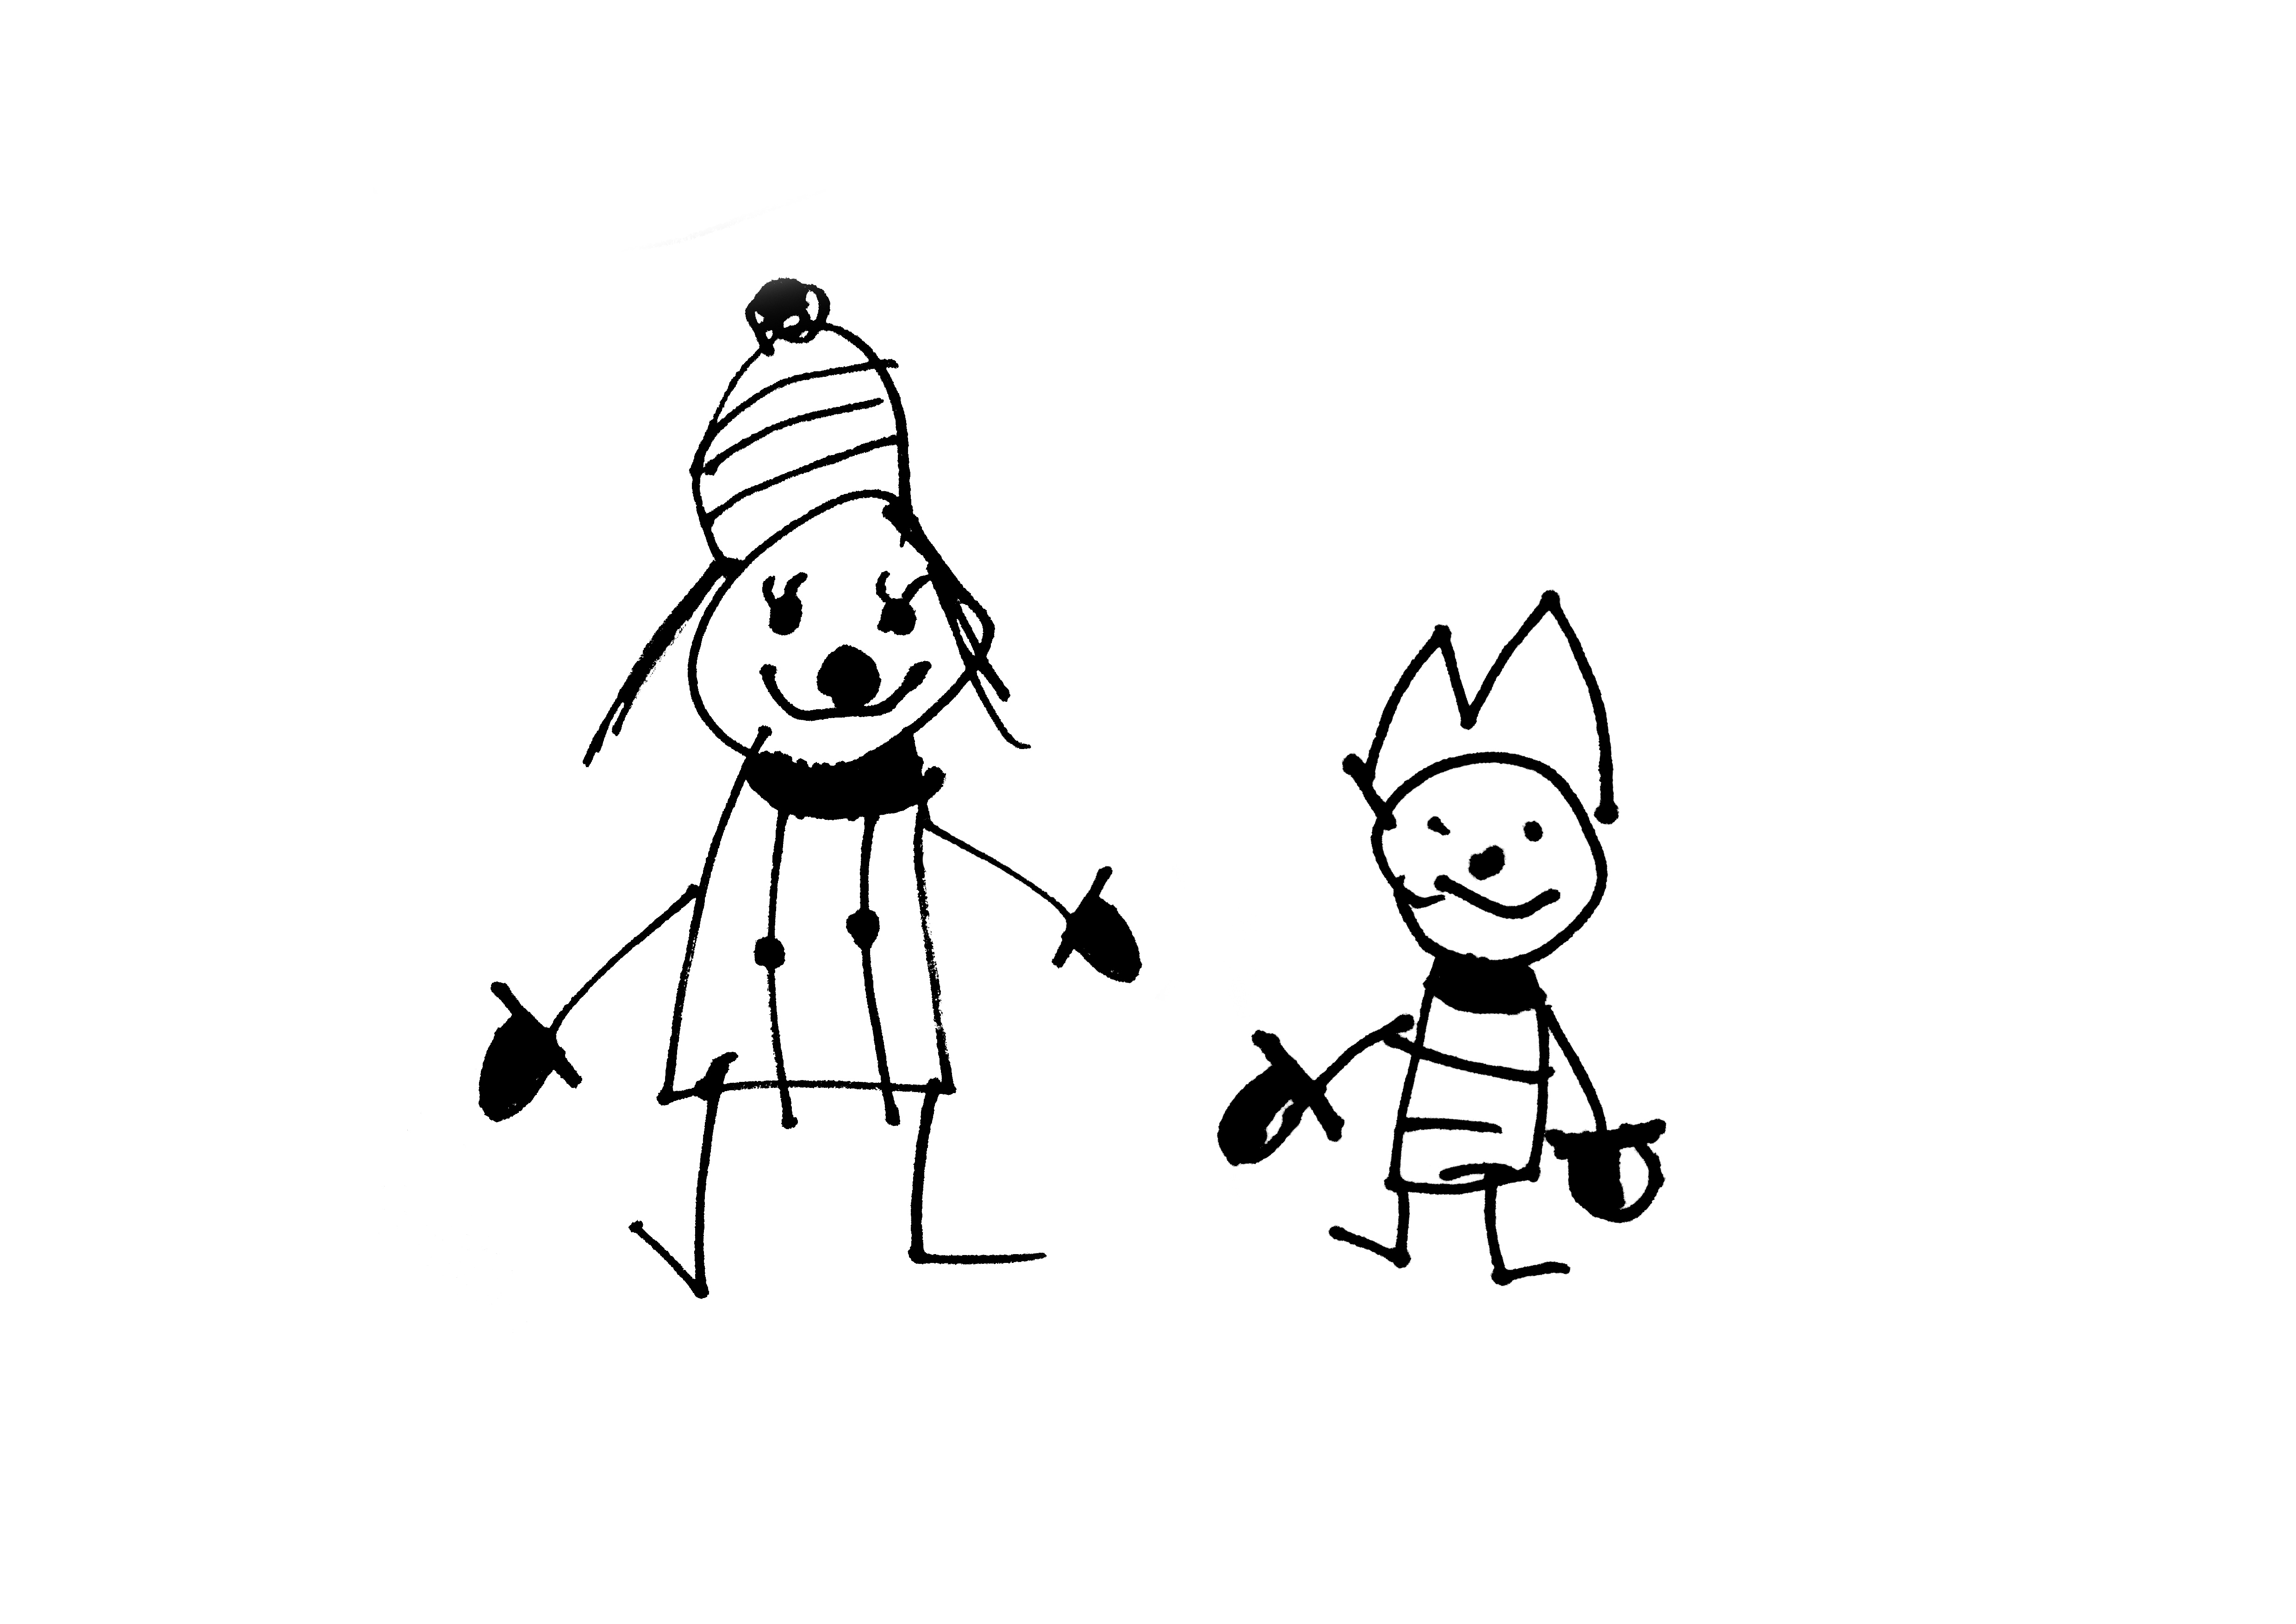 4961x3508 Character Design Childrens Drawings Superfastindyfish